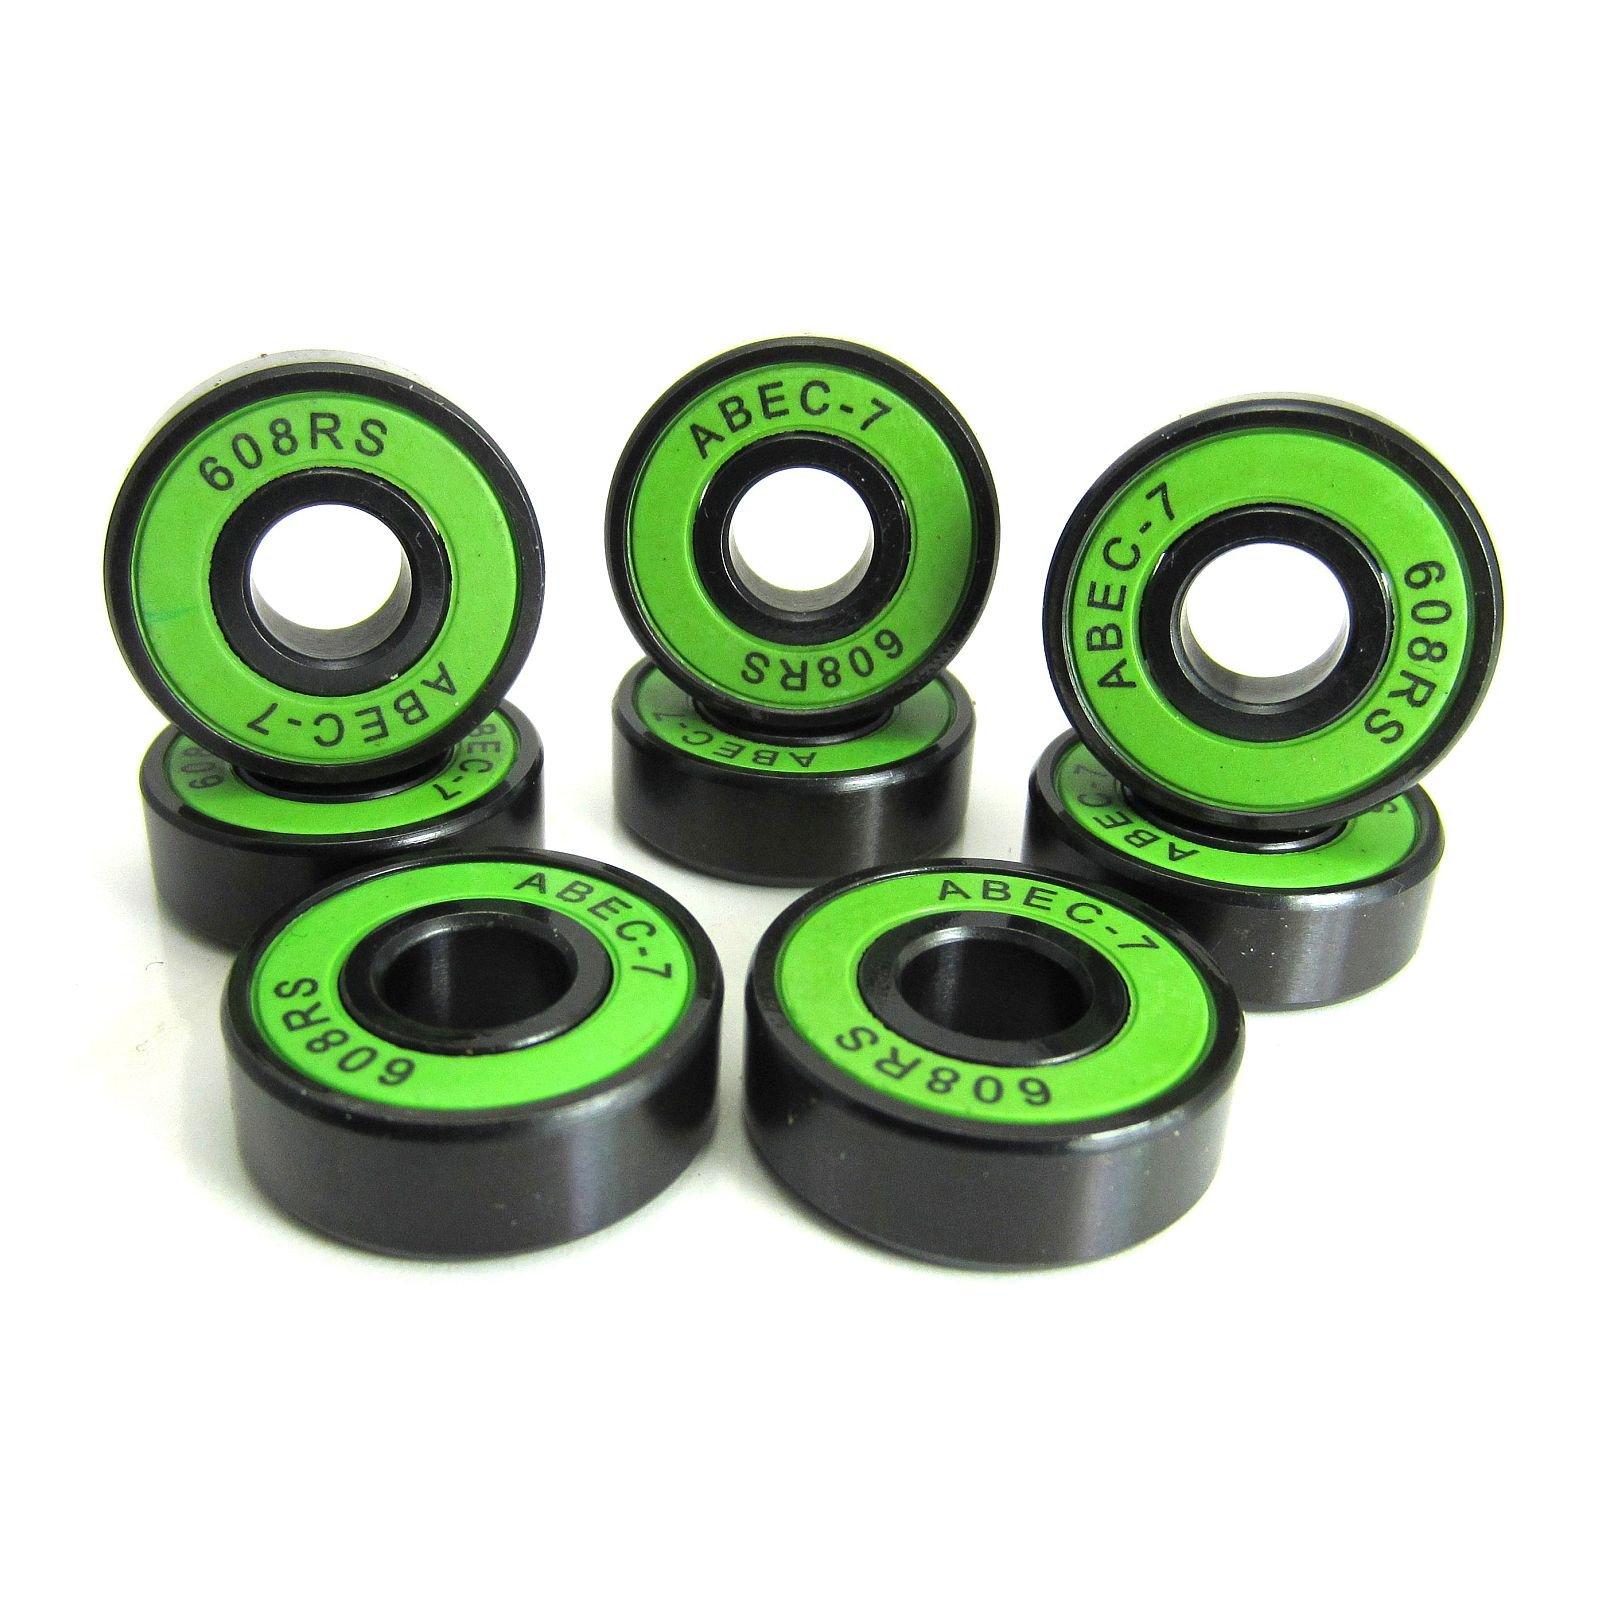 8x22x7mm BK-GR ABEC 7 Precision Skate Ball Bearings Rubber Seals (8)